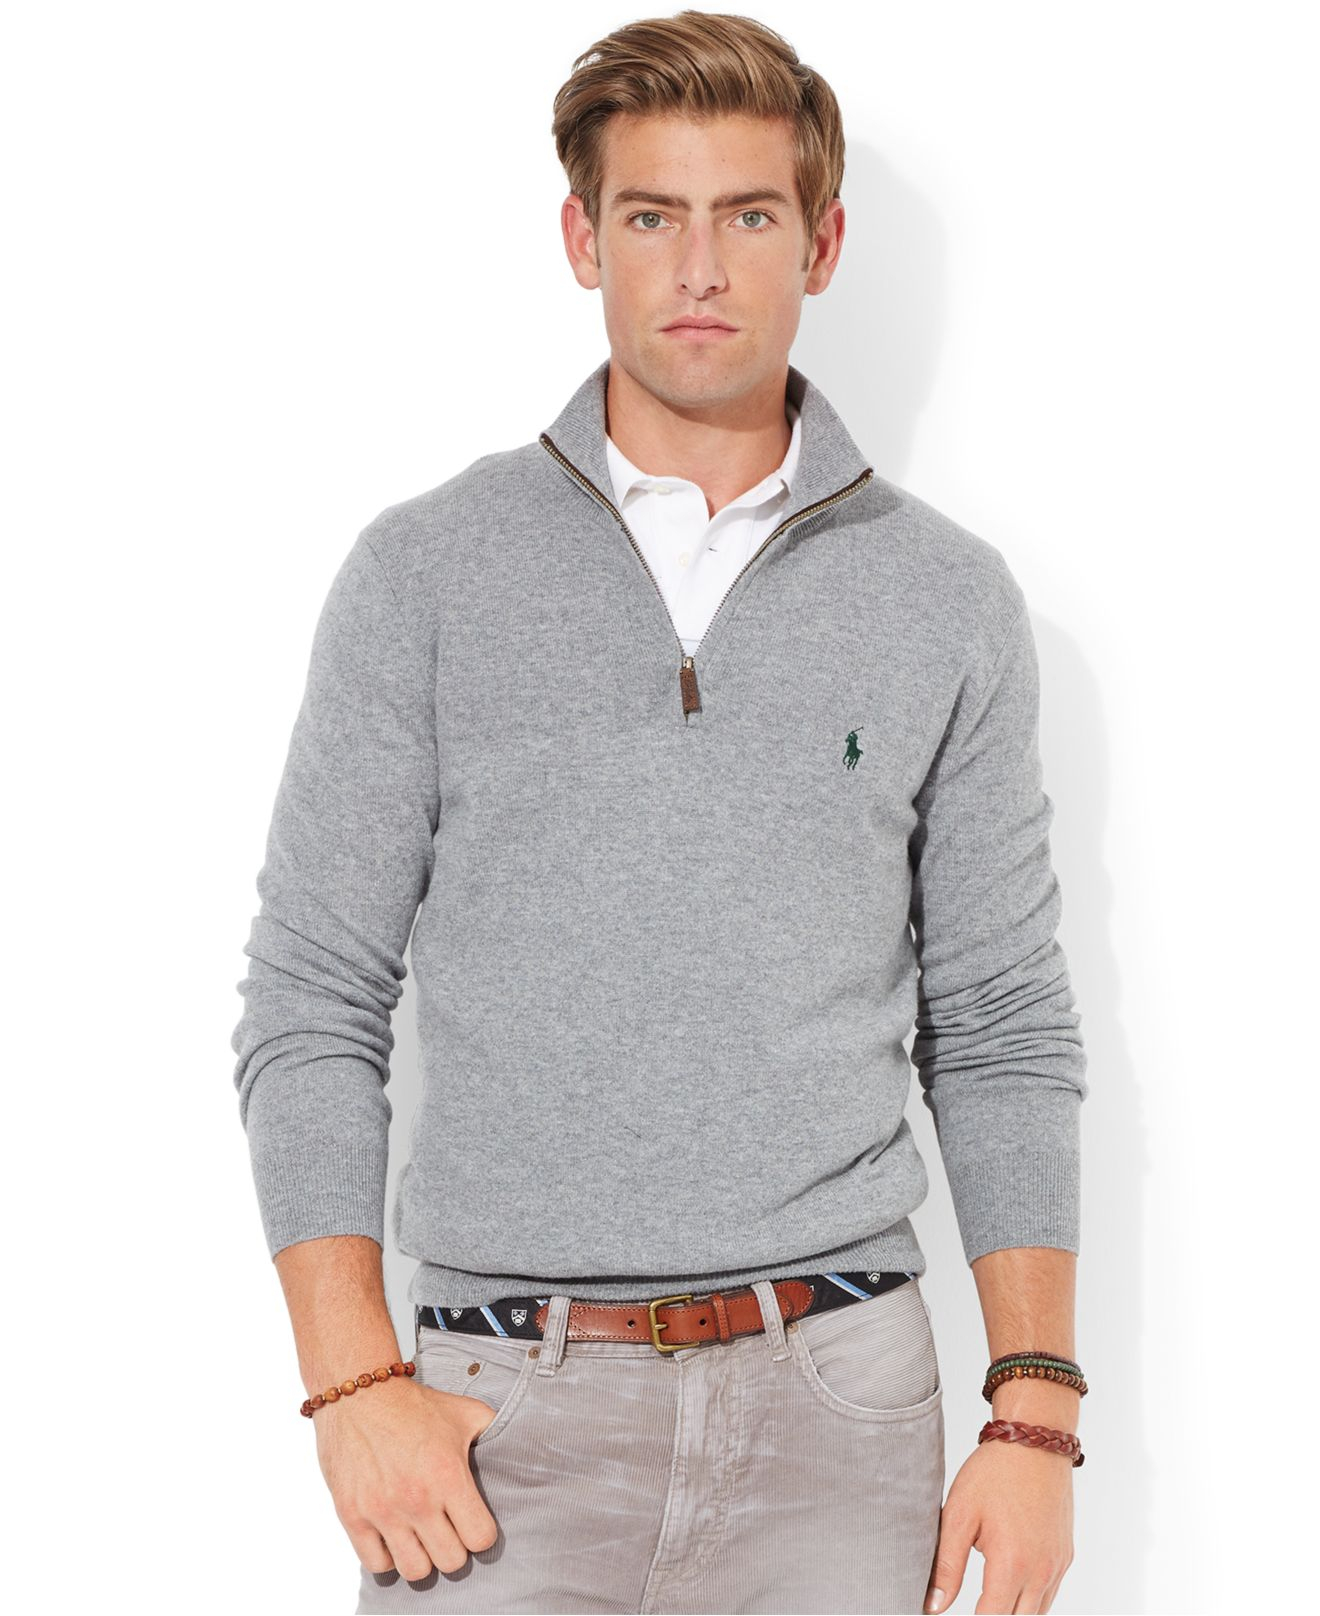 5089a116a Lyst - Polo Ralph Lauren Merino Wool Half-Zip Sweater in Gray for Men